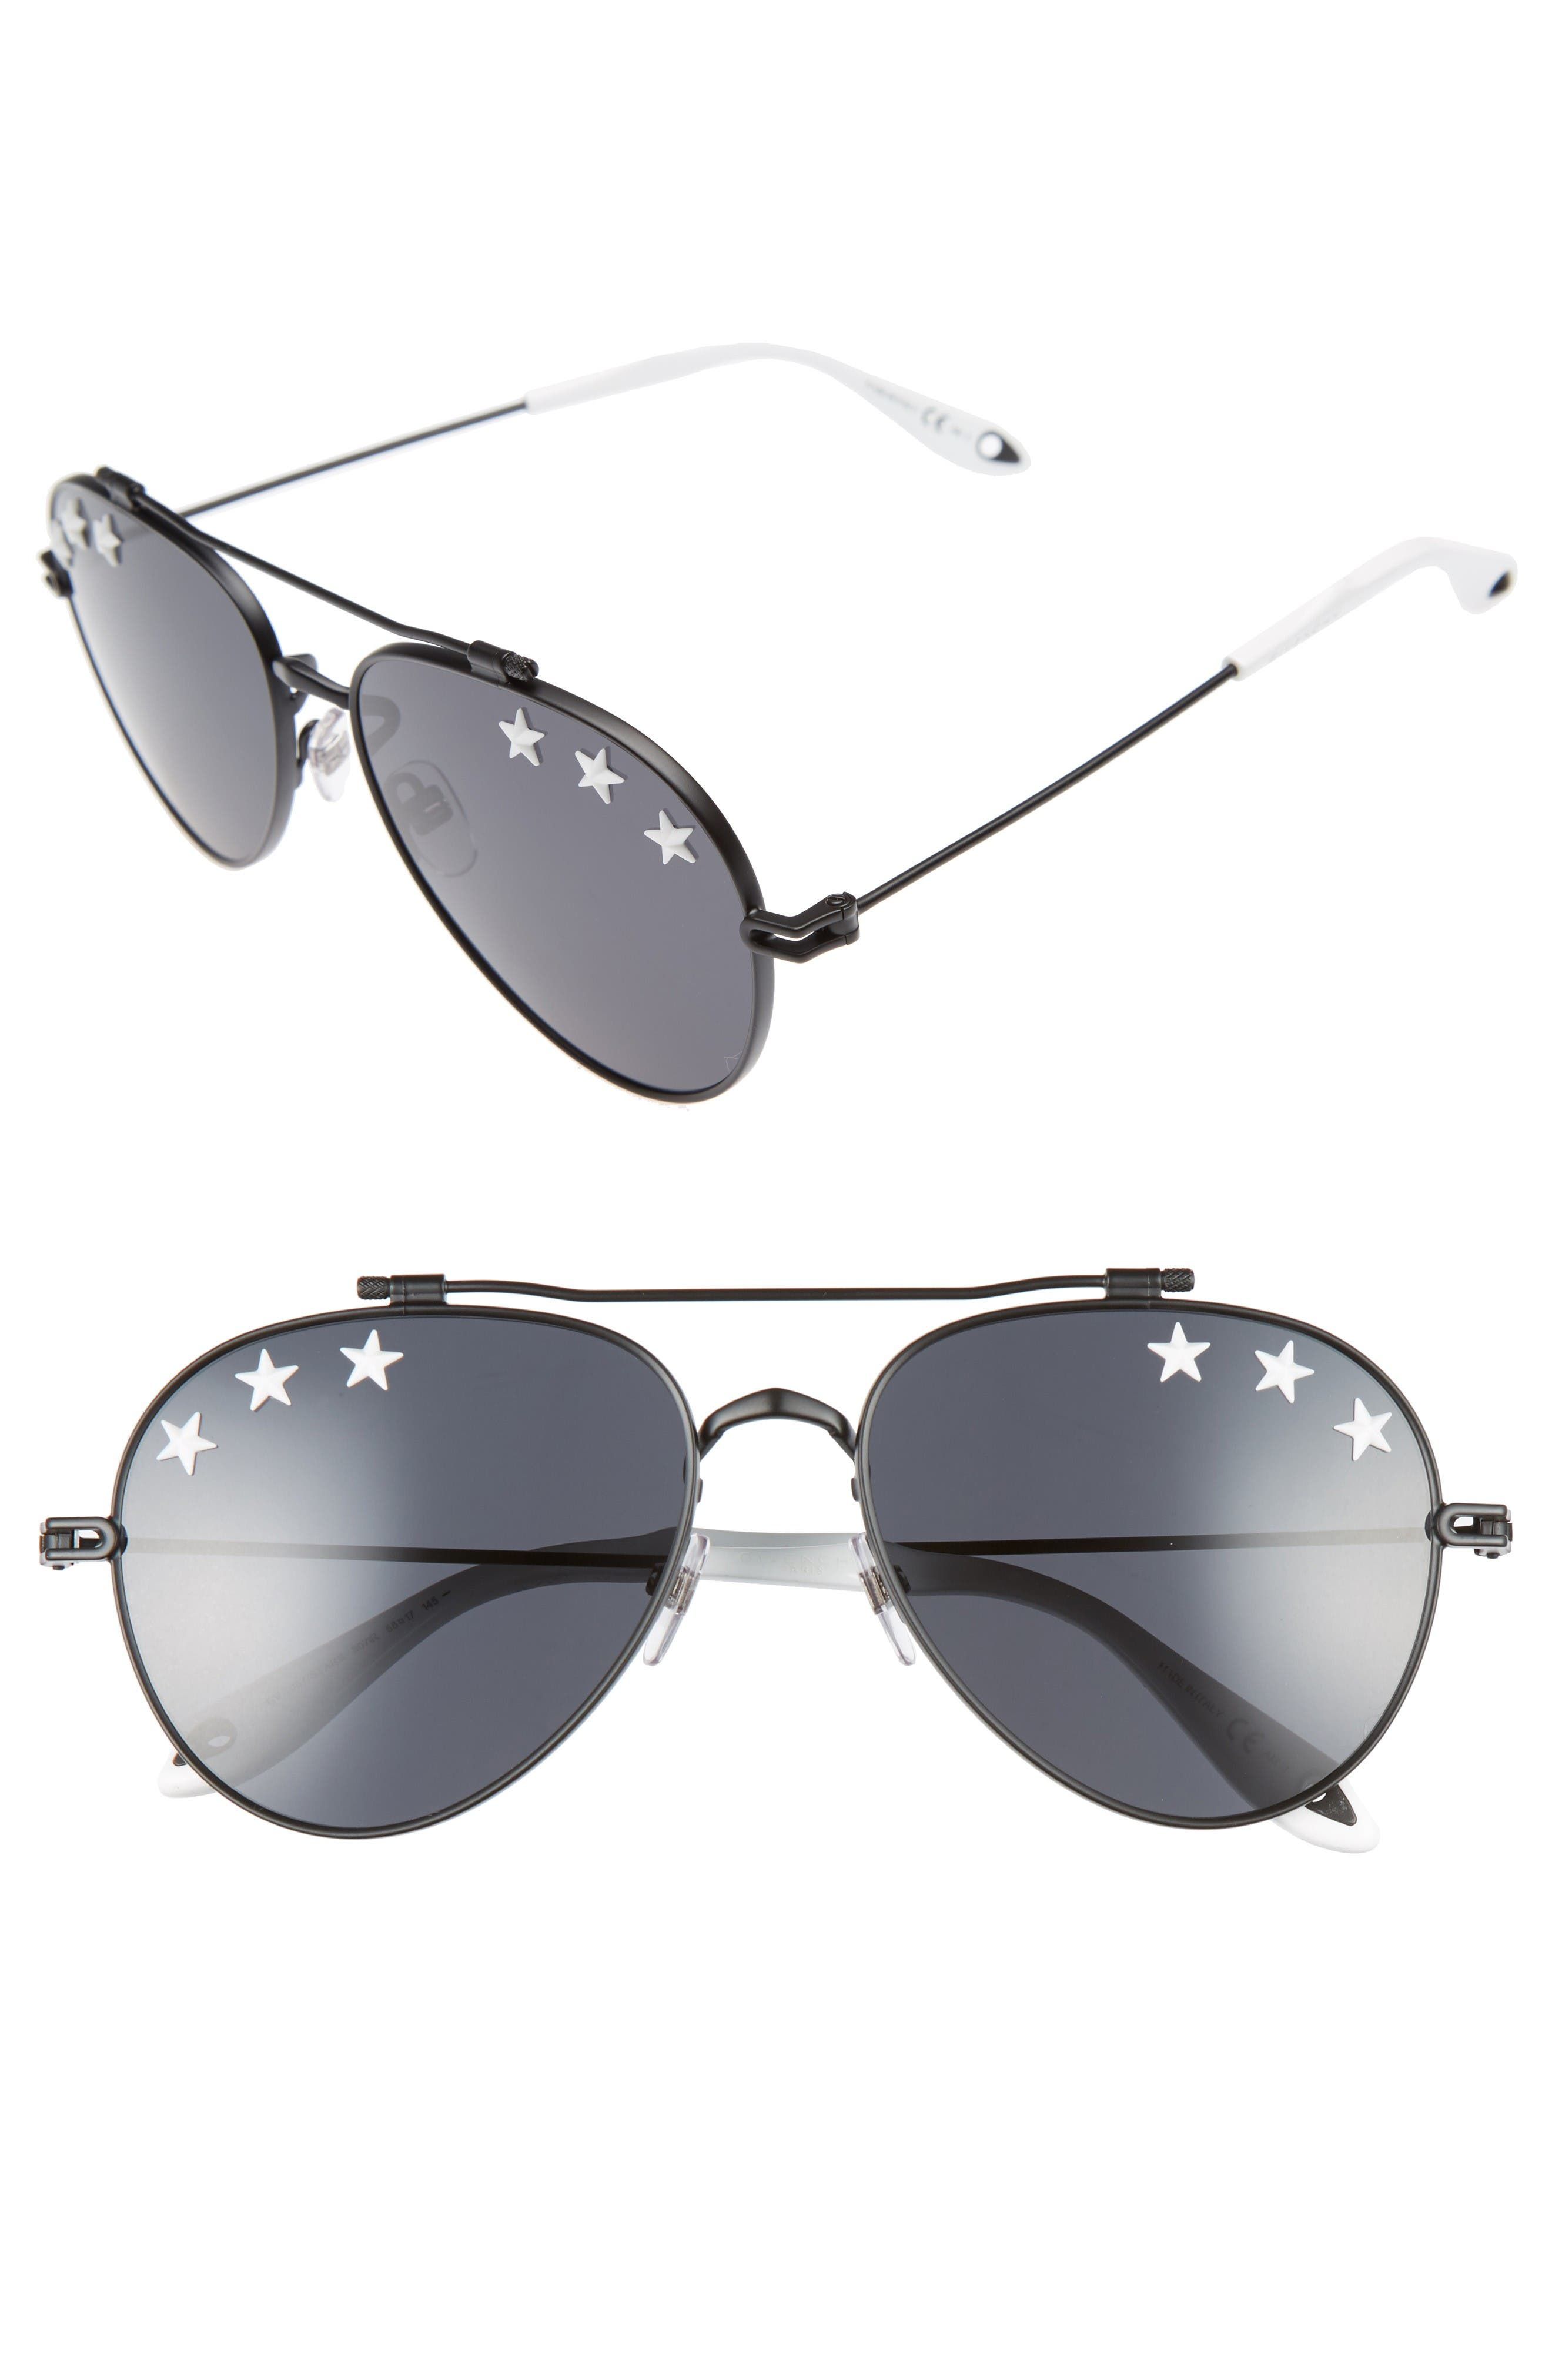 Main Image - Givenchy Star Detail 58mm Mirrored Aviator Sunglasses